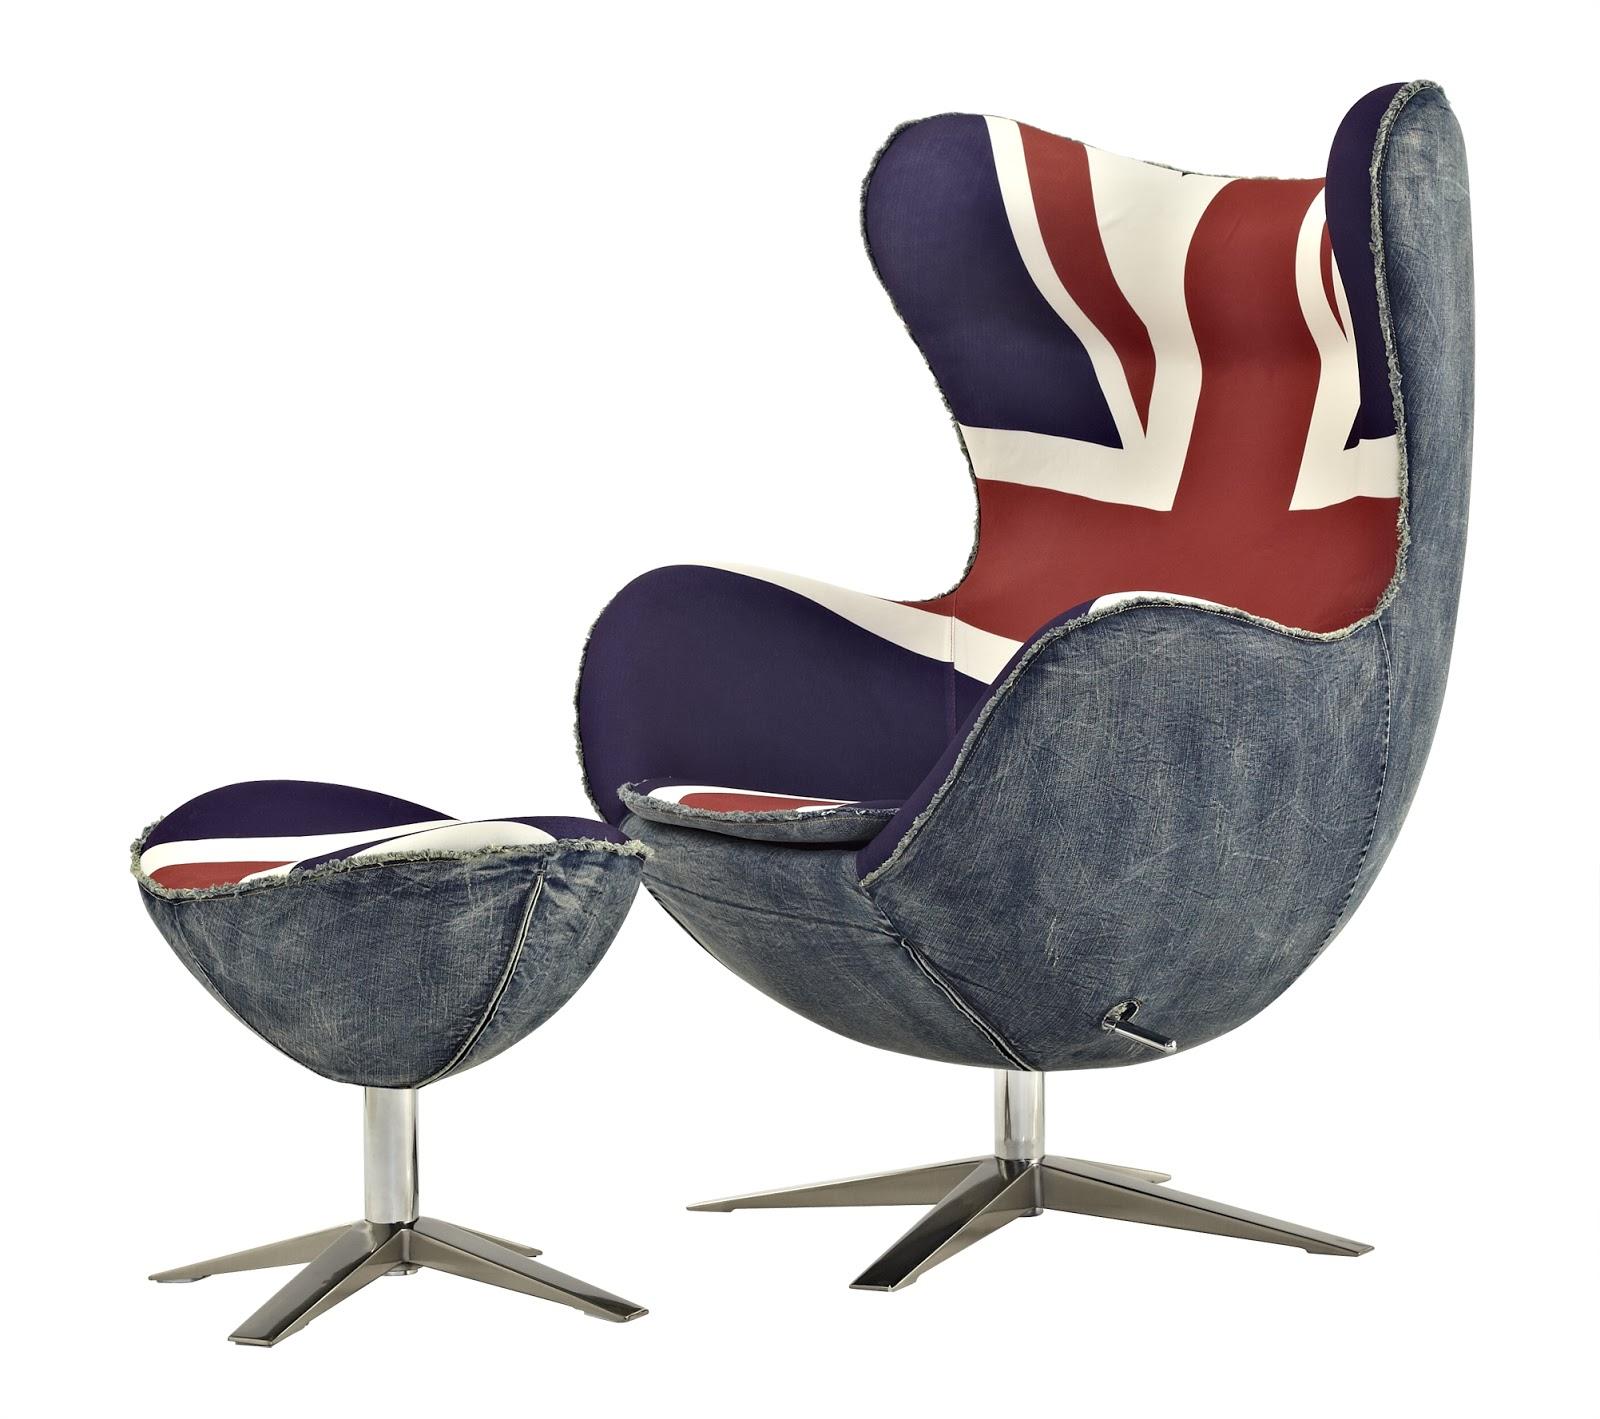 arne jacobsen egg chair replicas. Black Bedroom Furniture Sets. Home Design Ideas